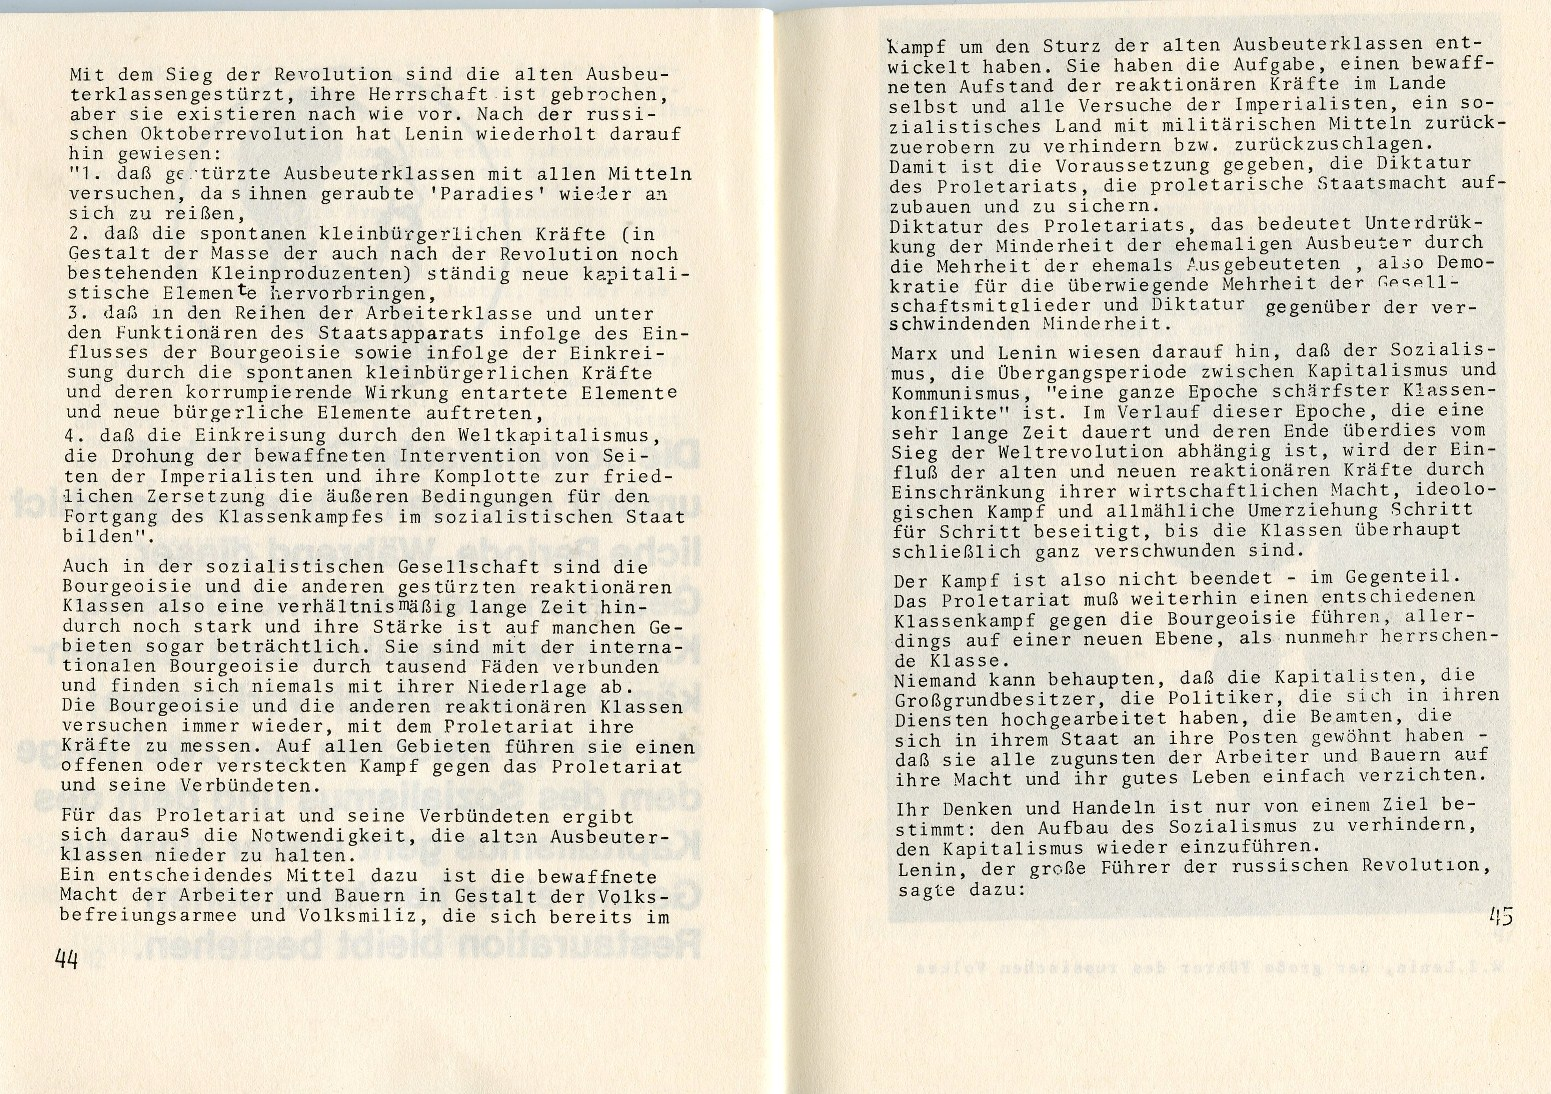 ZB_KPChinas_1971_24